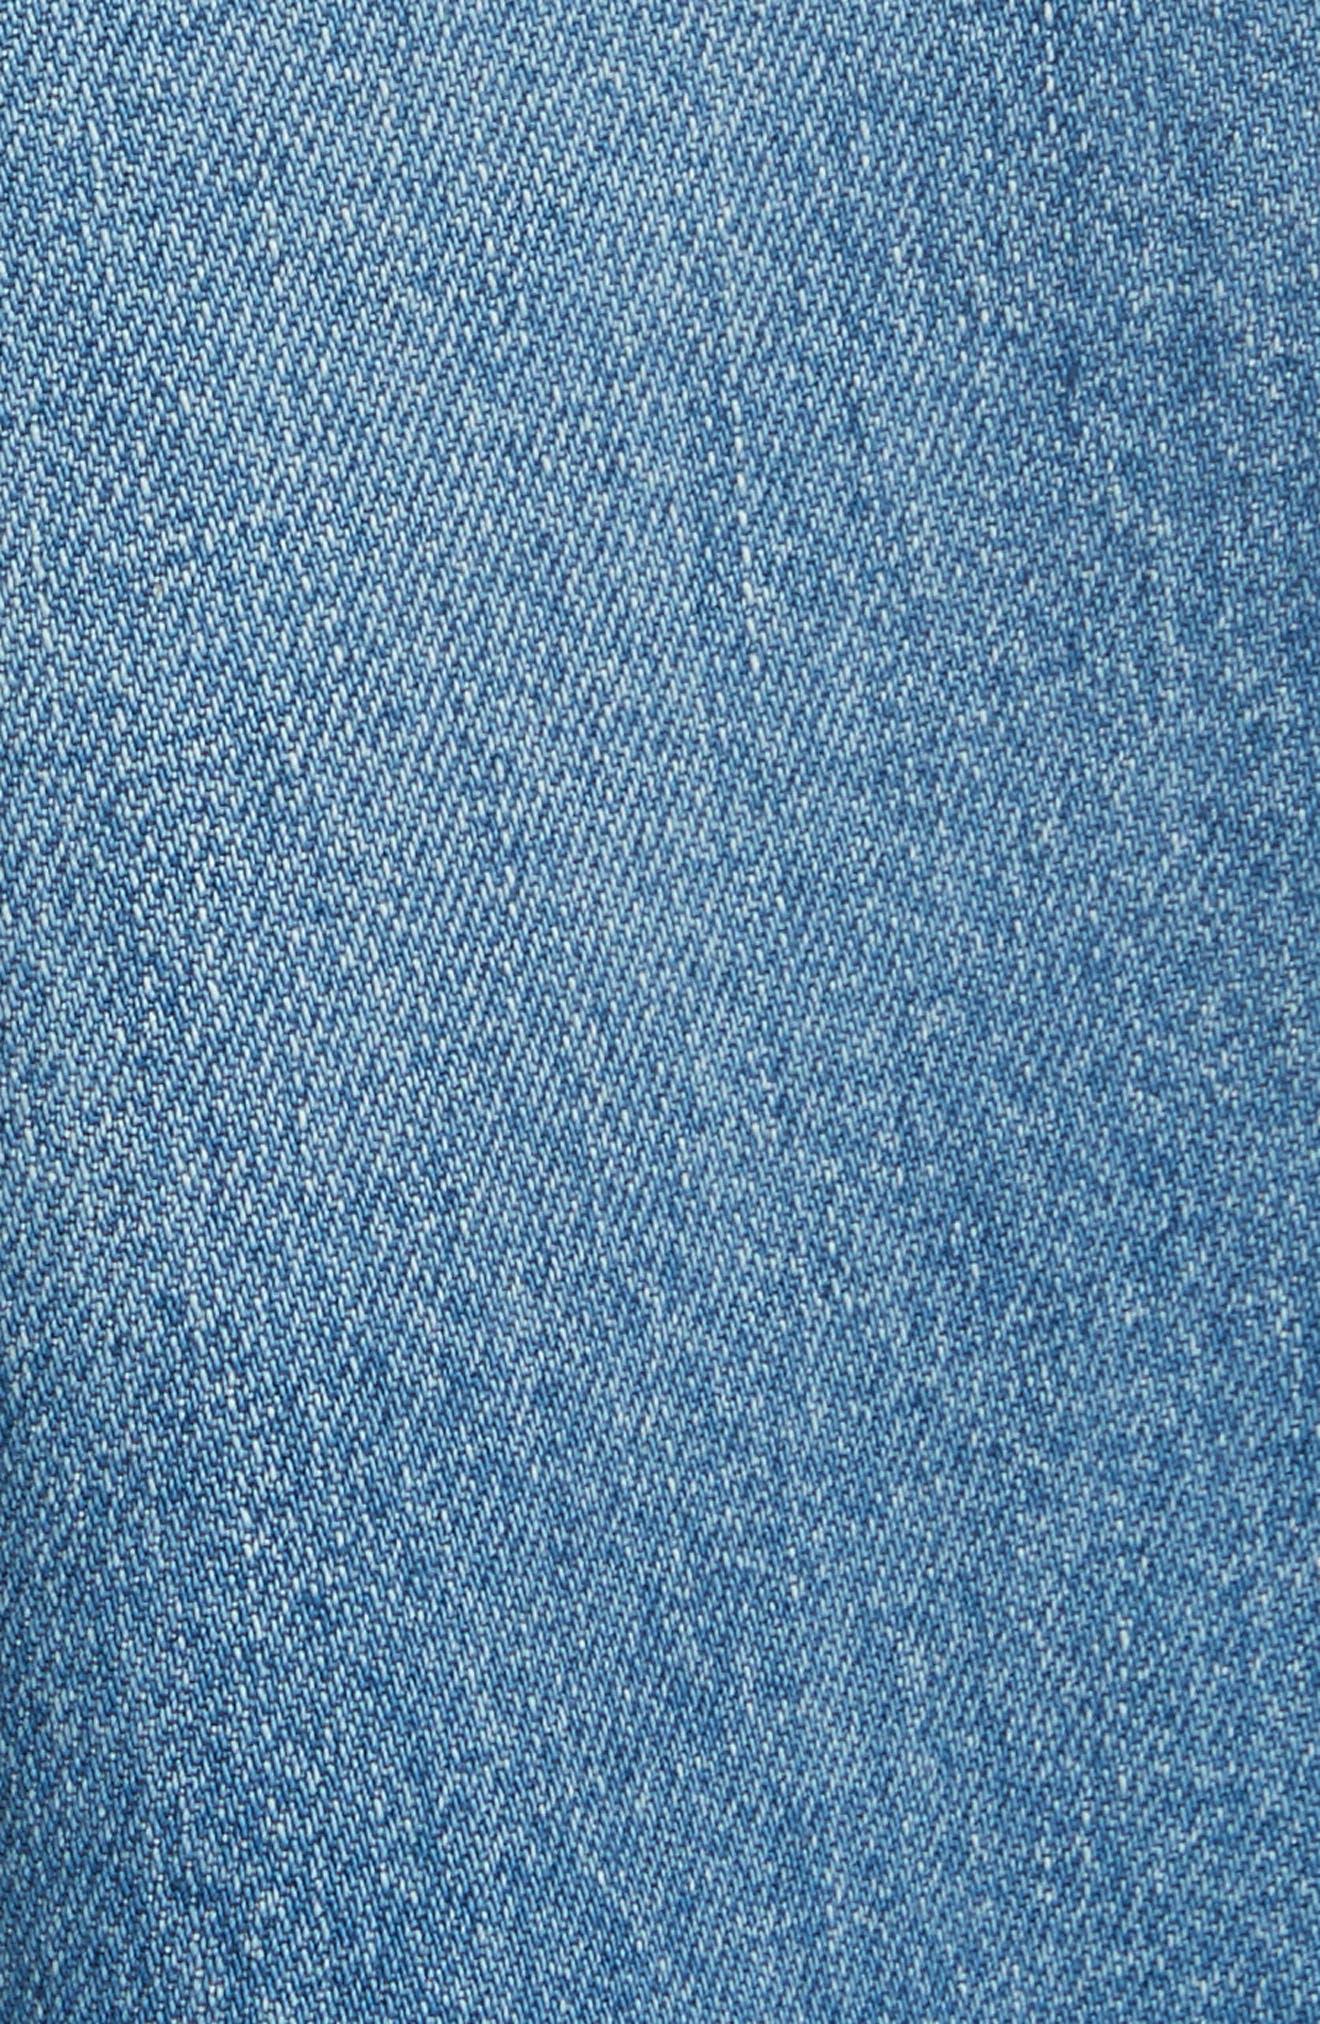 Studded Denim Culottes,                             Alternate thumbnail 5, color,                             400